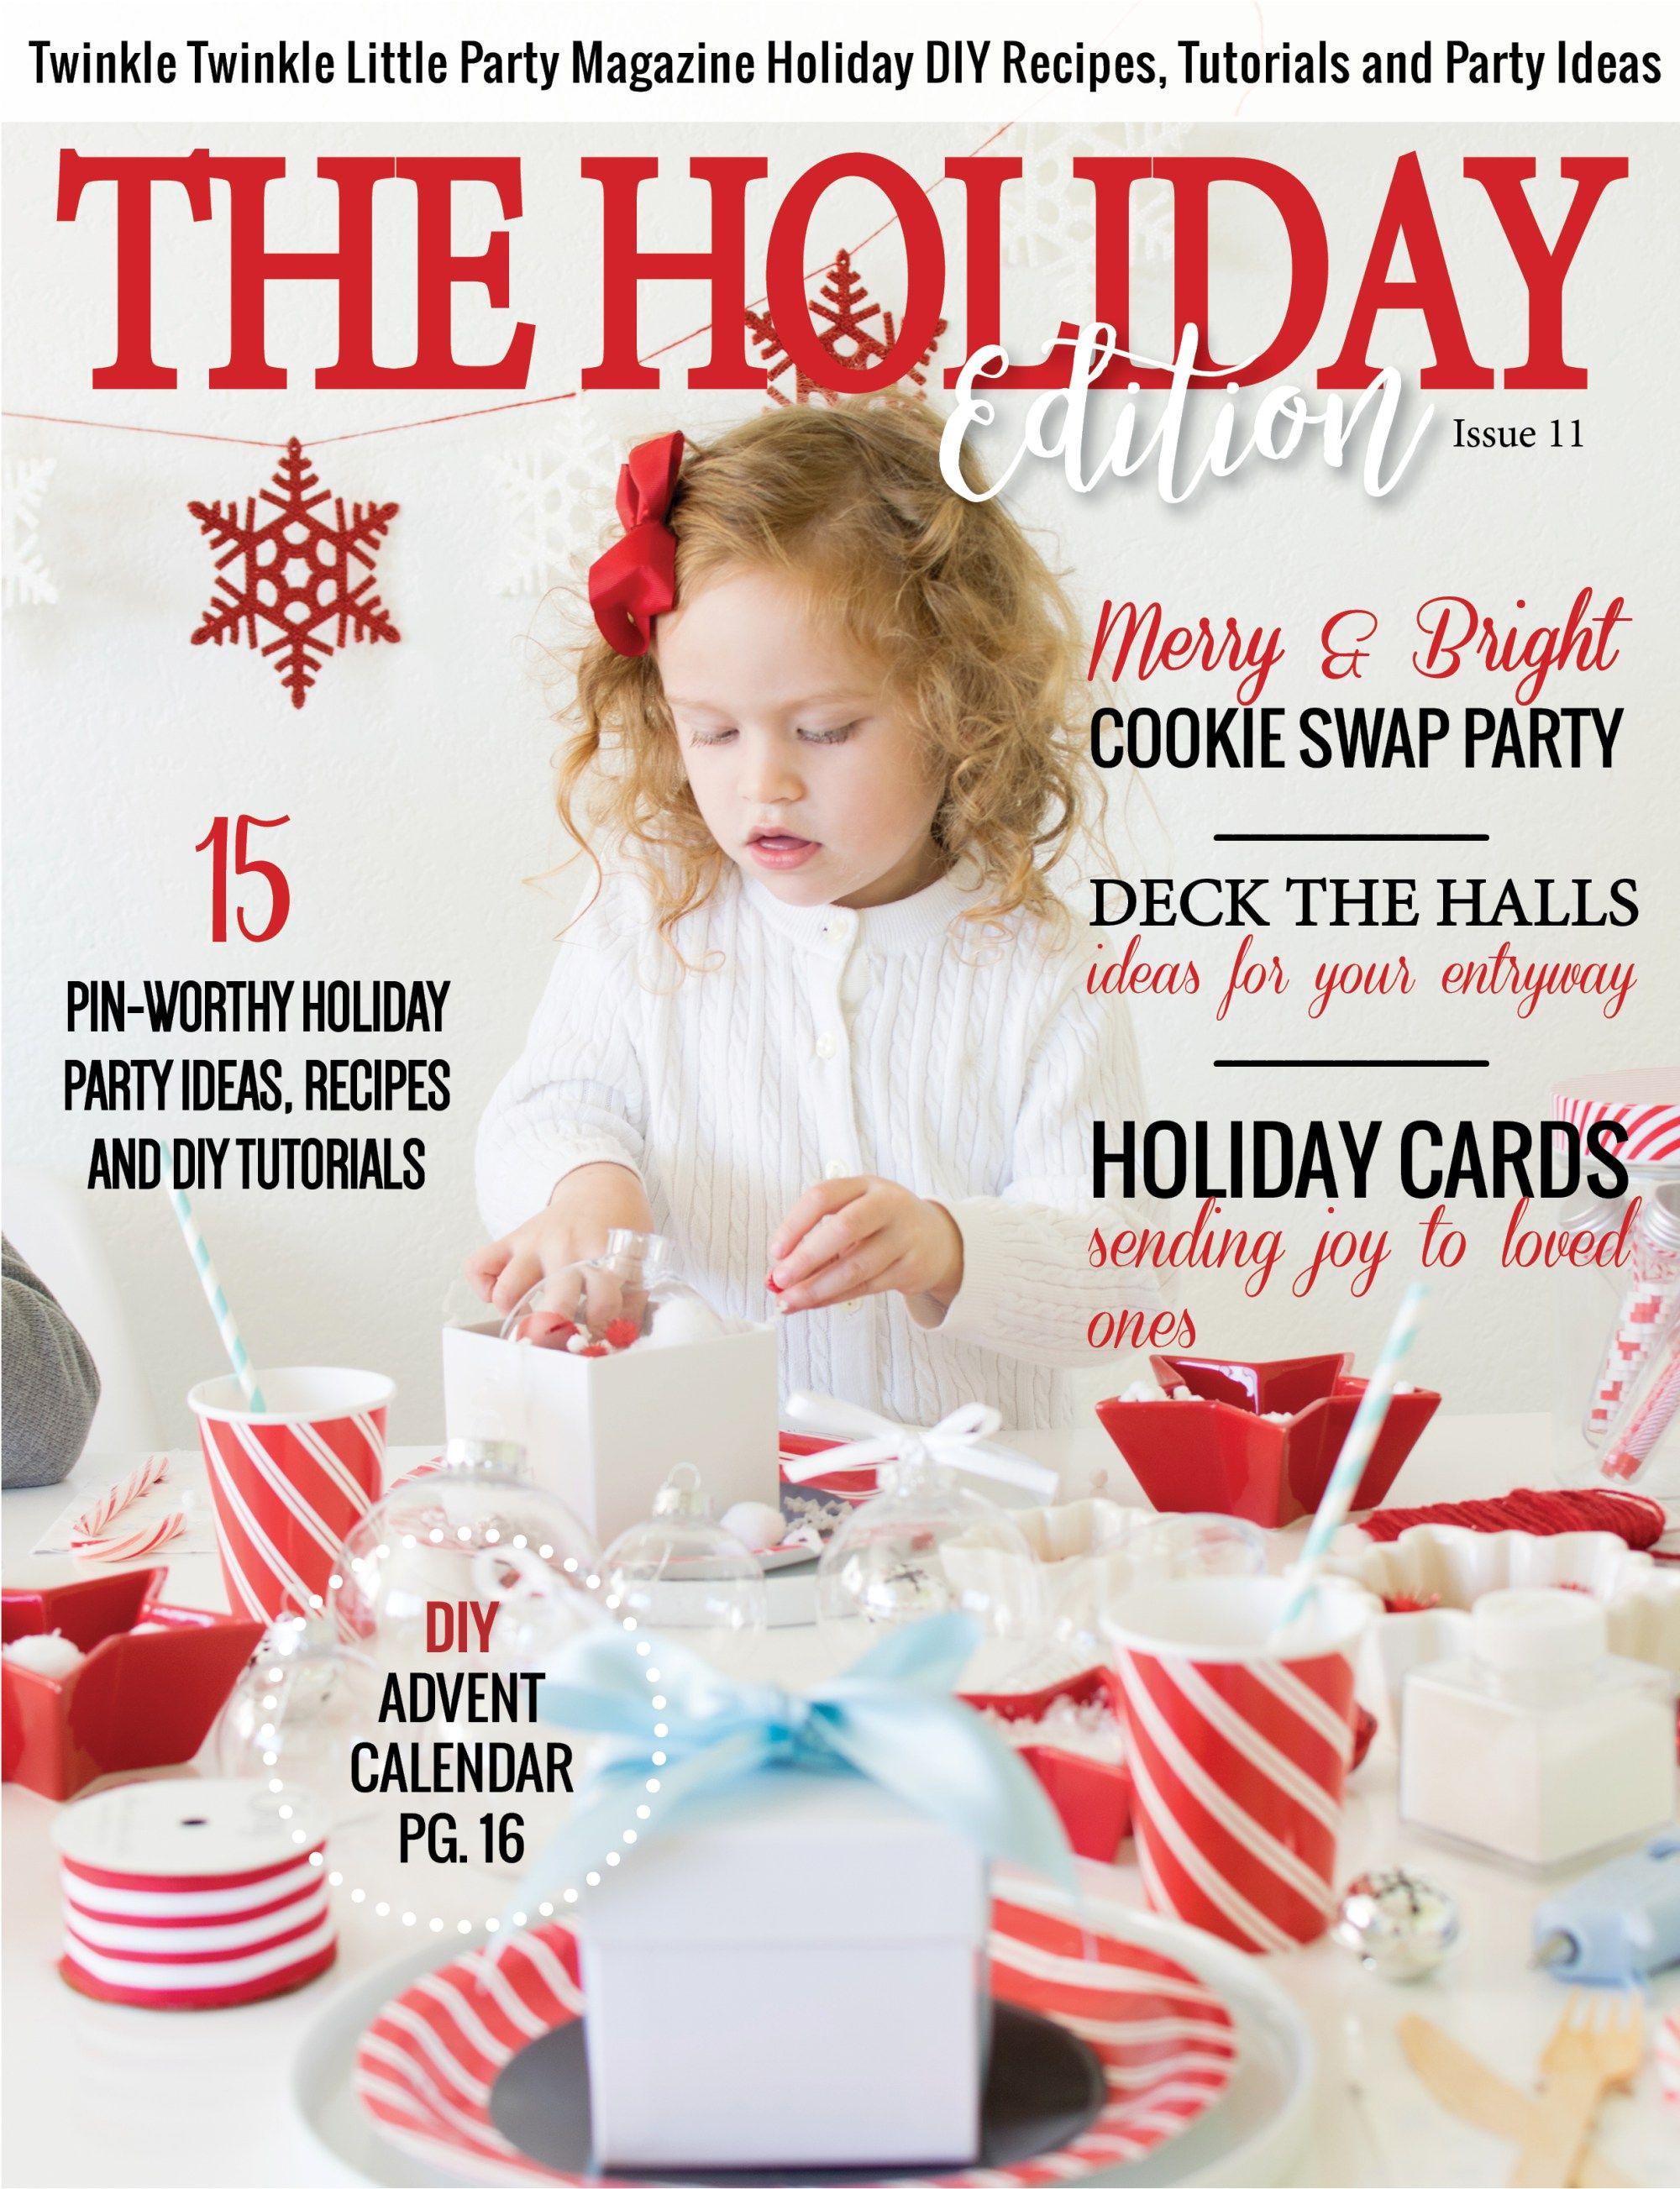 Magazine - Holiday Issue | Pinterest | Twinkle twinkle, Holidays and ...